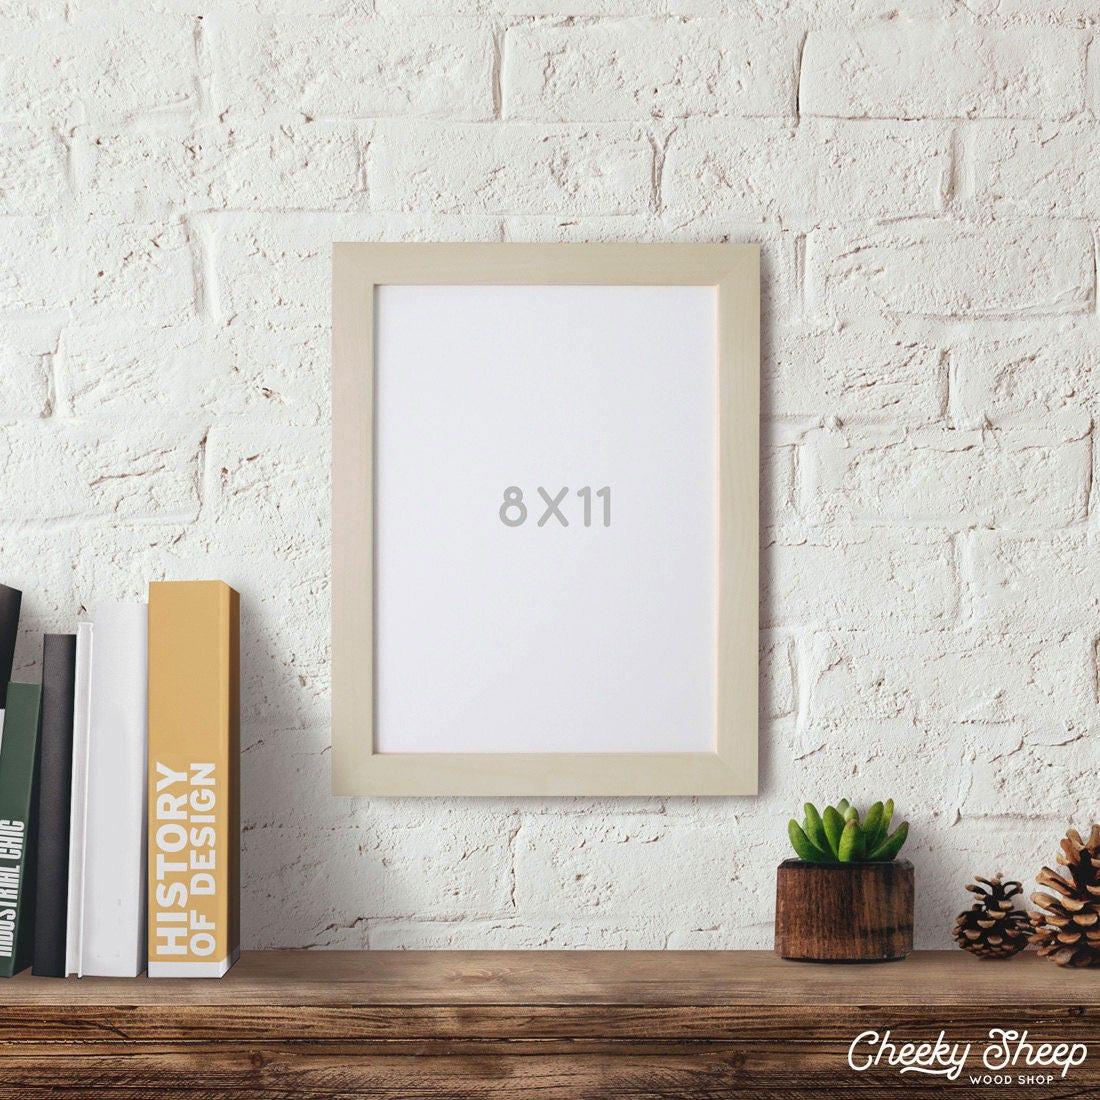 8 x 11 imagen marco artesanal marco madera marco marco hogar